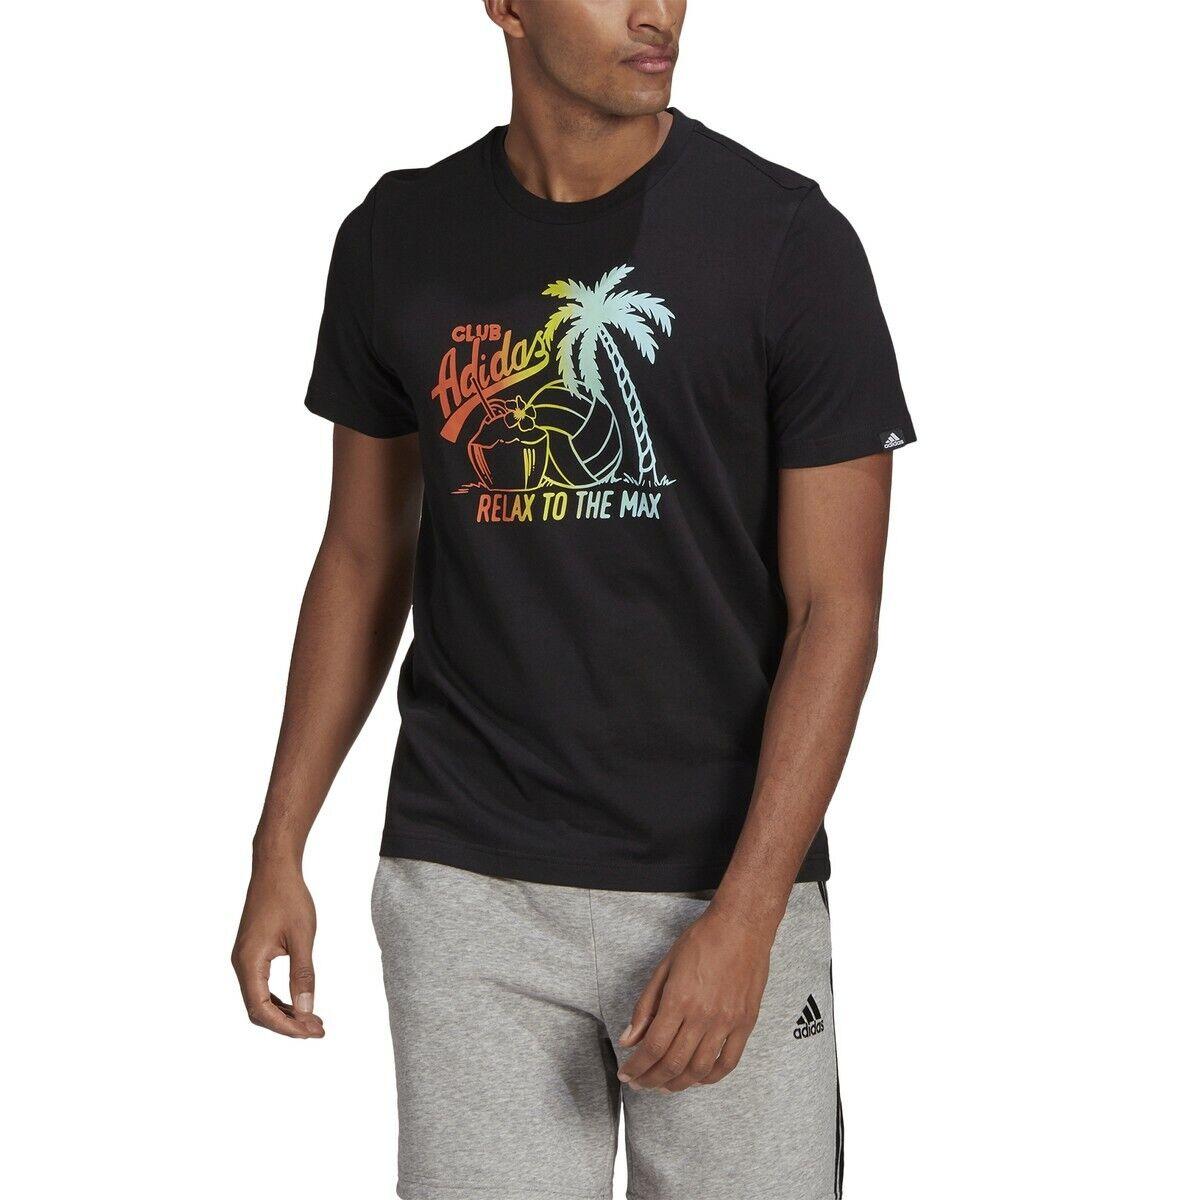 Adidas T-Shirt Art. GL3222 Mod. M Vcyrdyrlxmx Tee - 26,25€